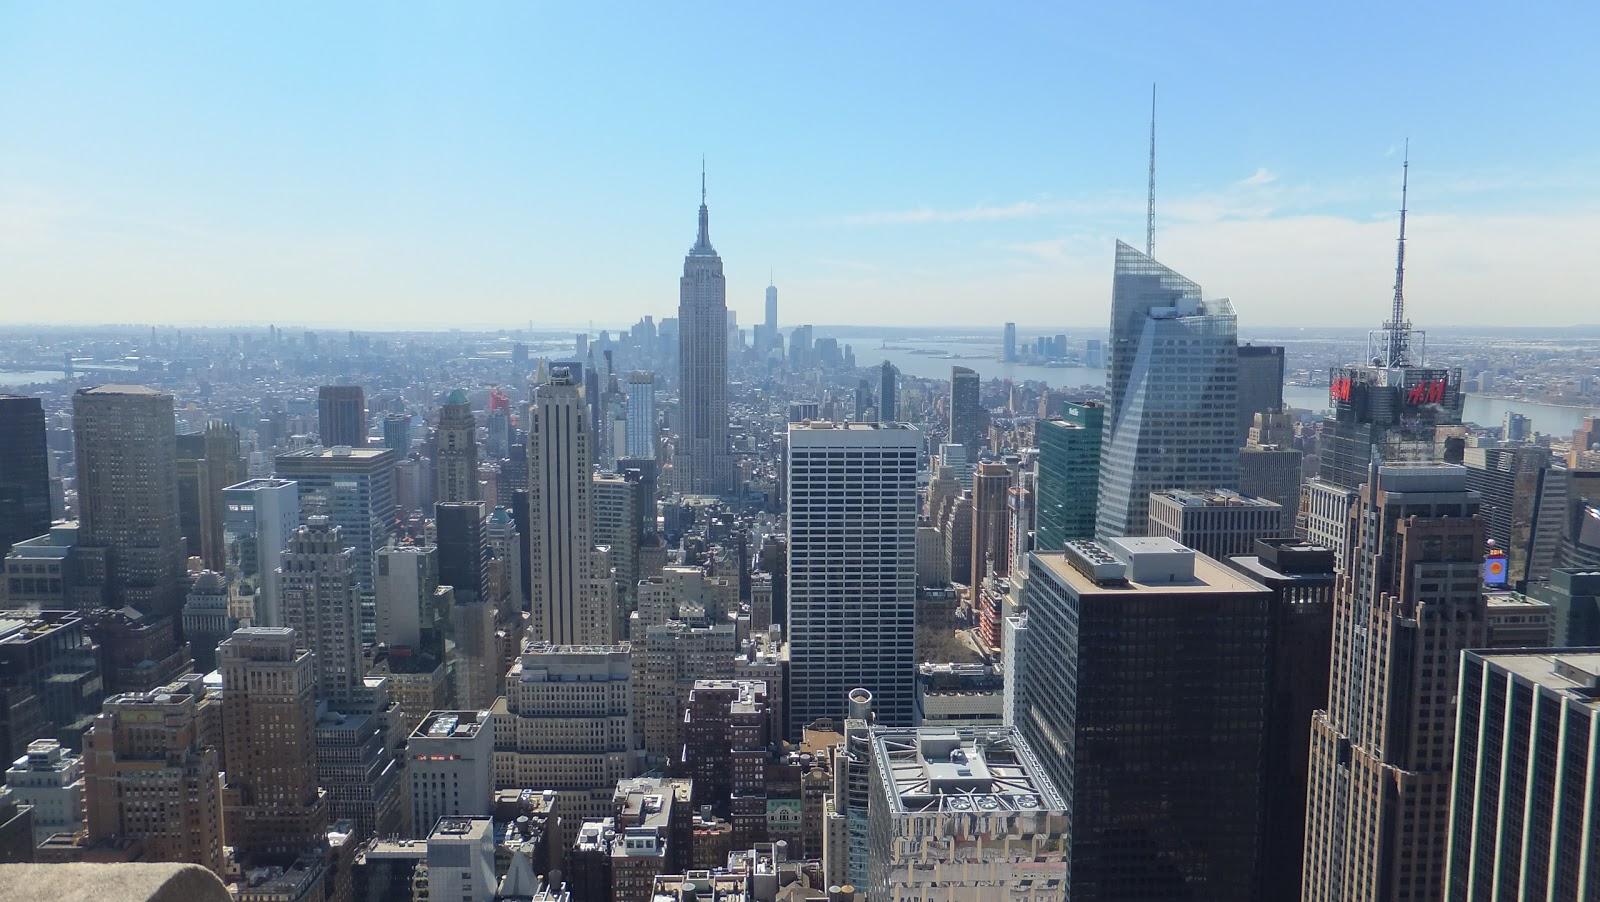 Manhattan vista desde The Top of the Rock, Elisa N, Blog de Viajes, Lifestyle, Travel